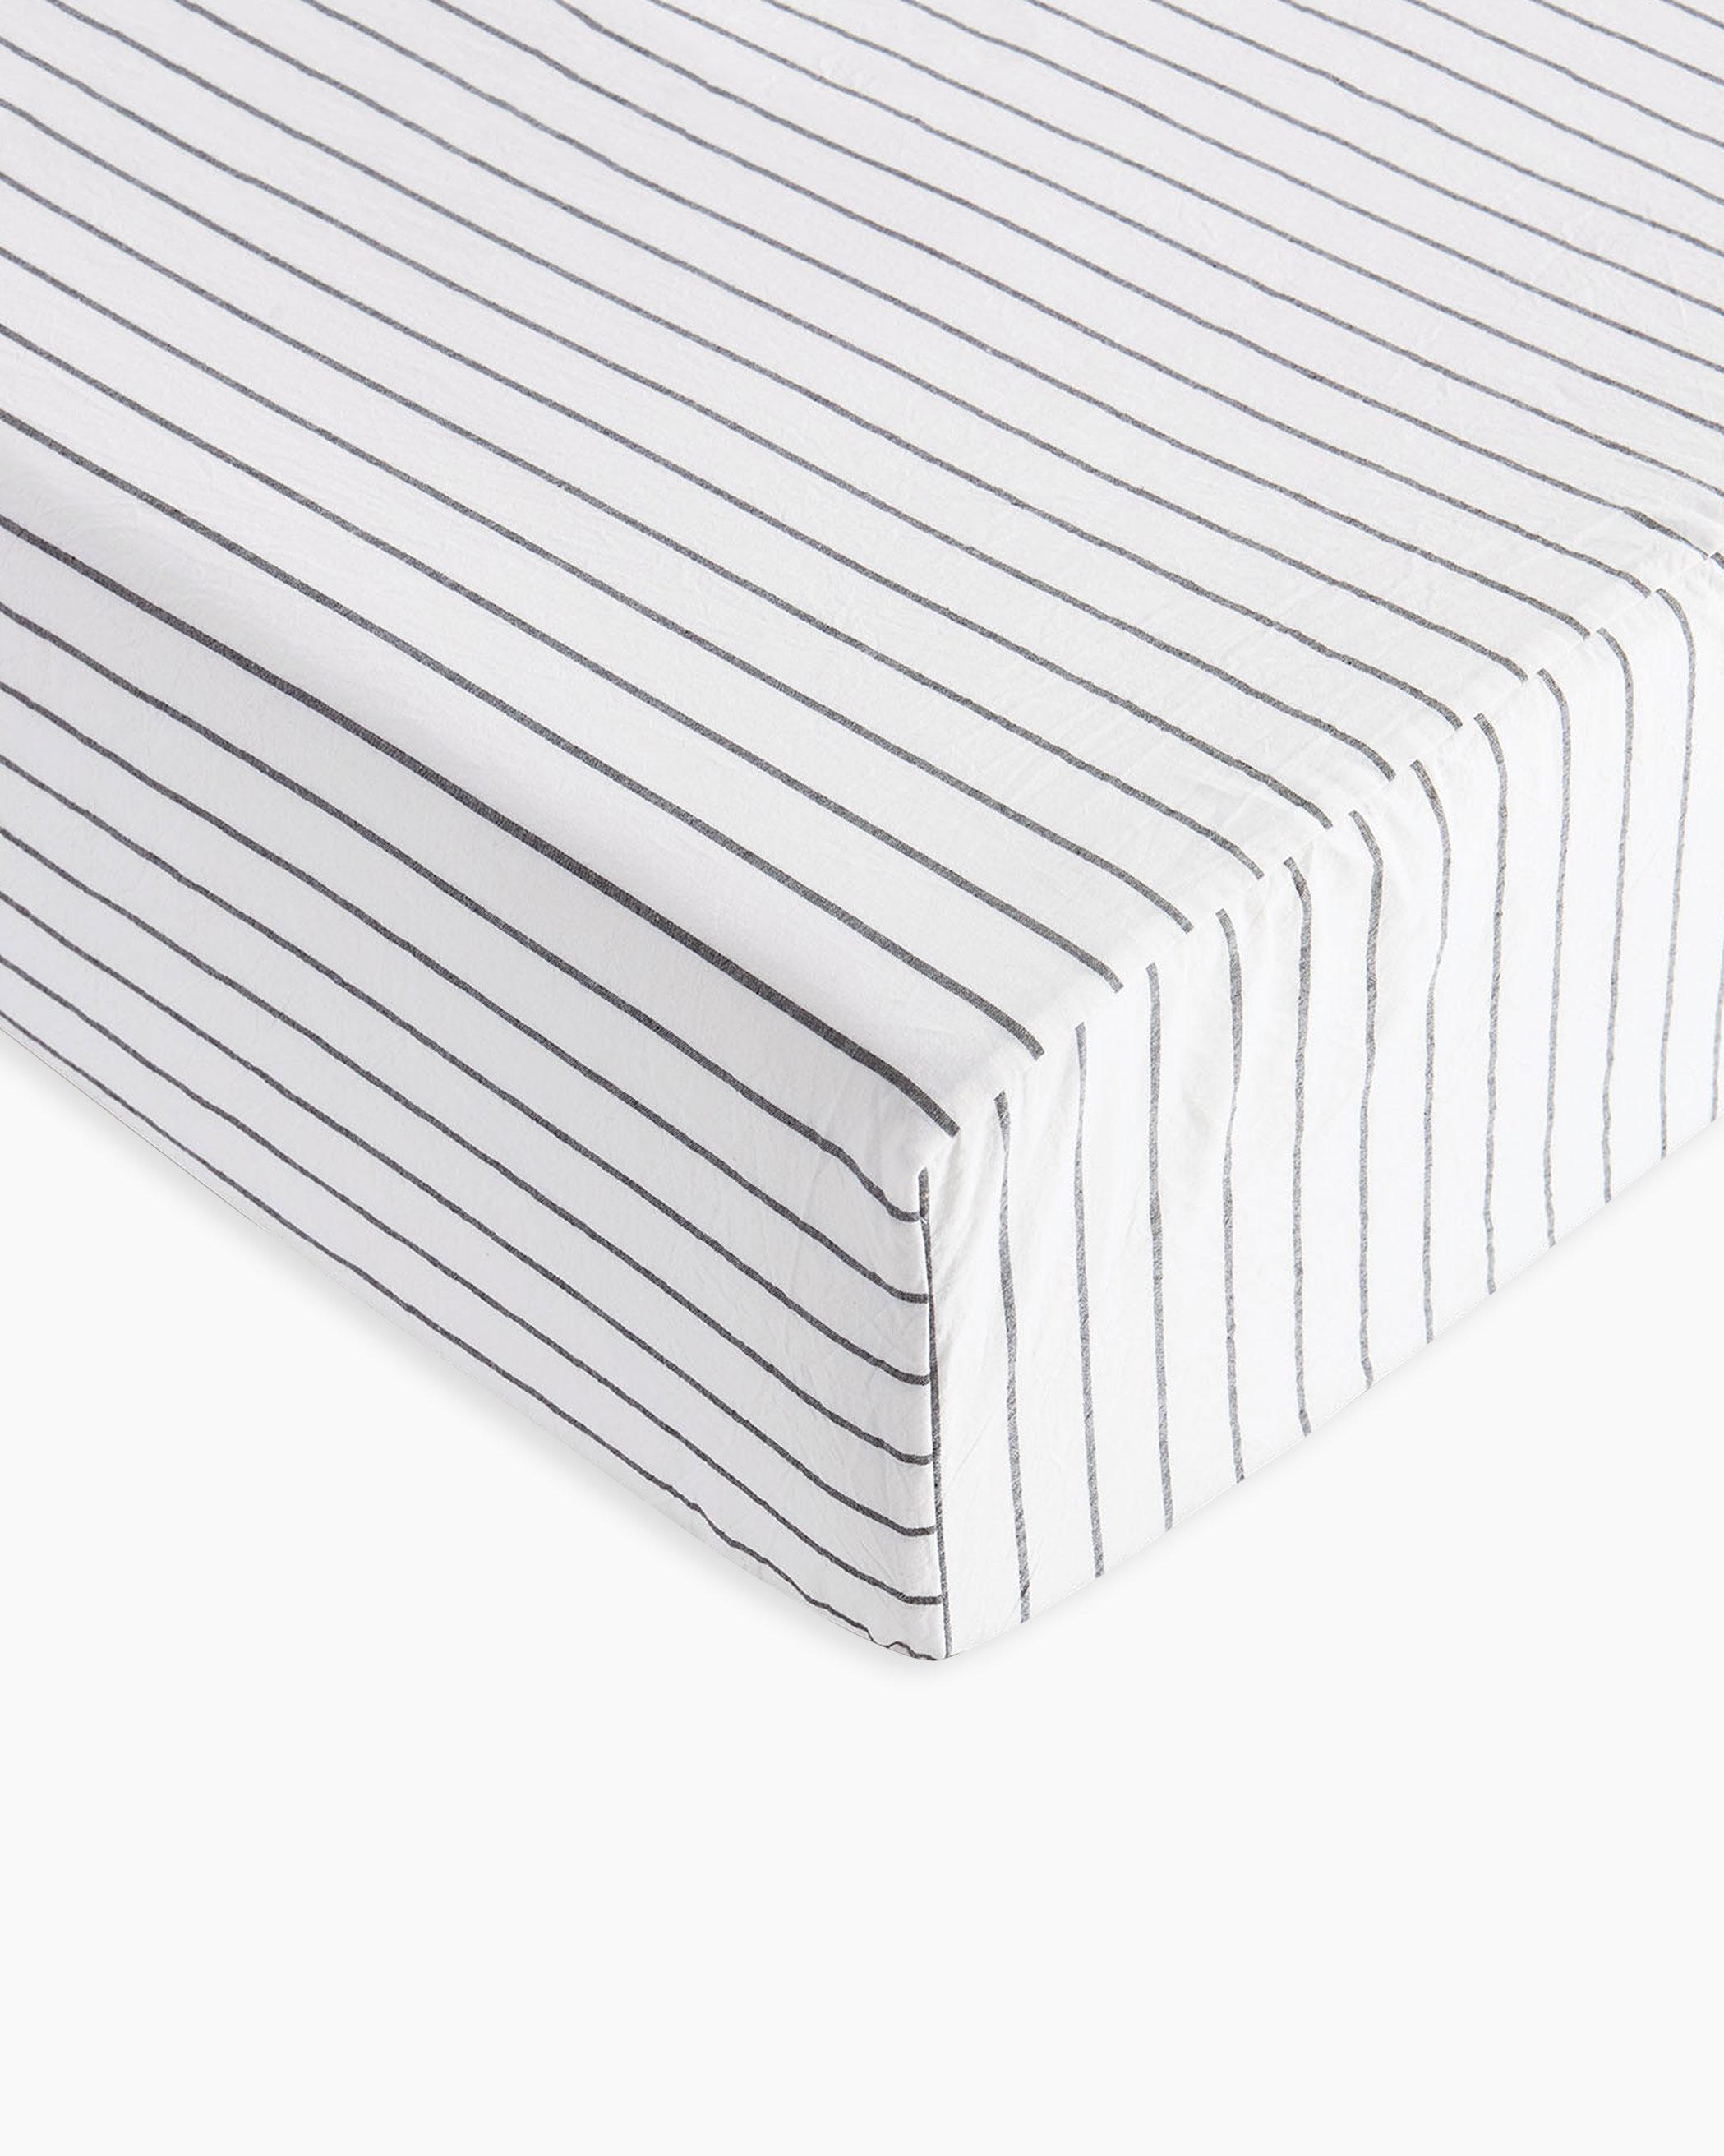 White Striped Washed Cotton Sheet Set